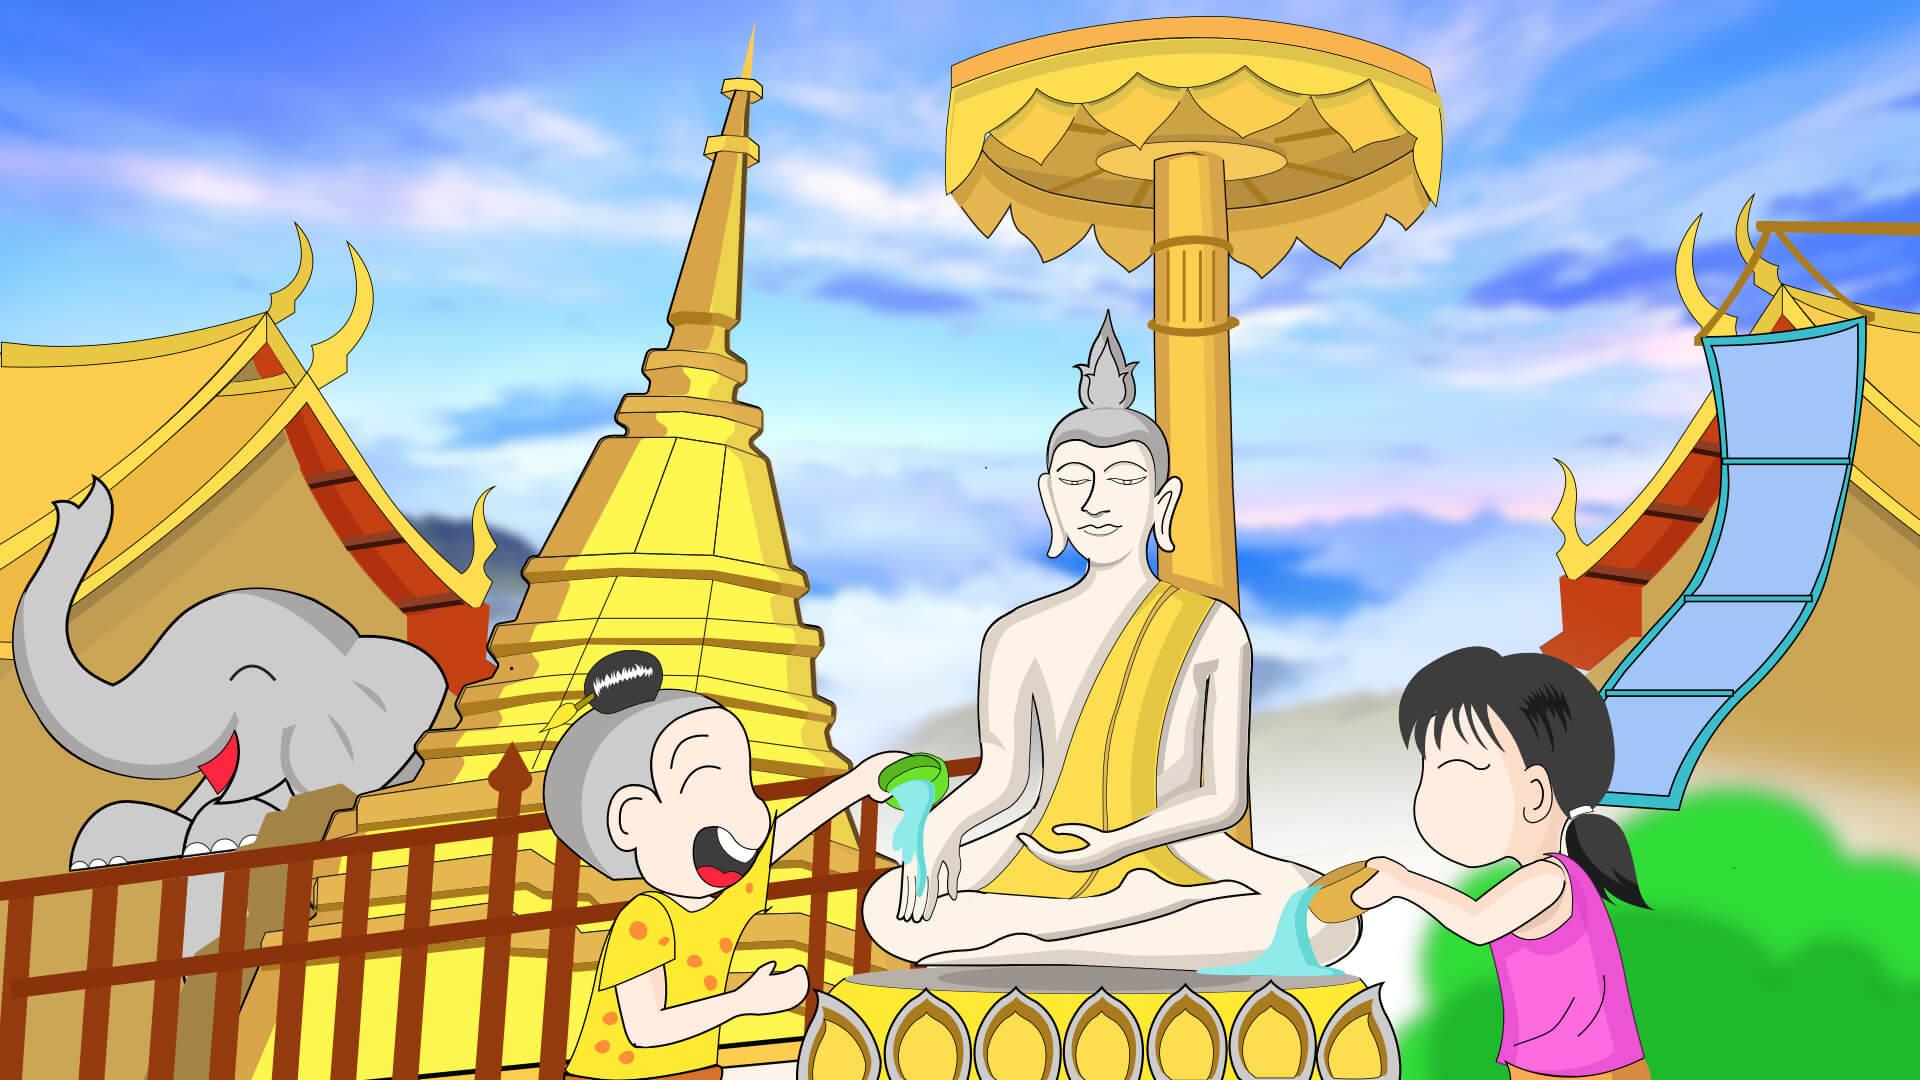 Songkran festival animated HD wallpapers kids worshipping Lord Buddha